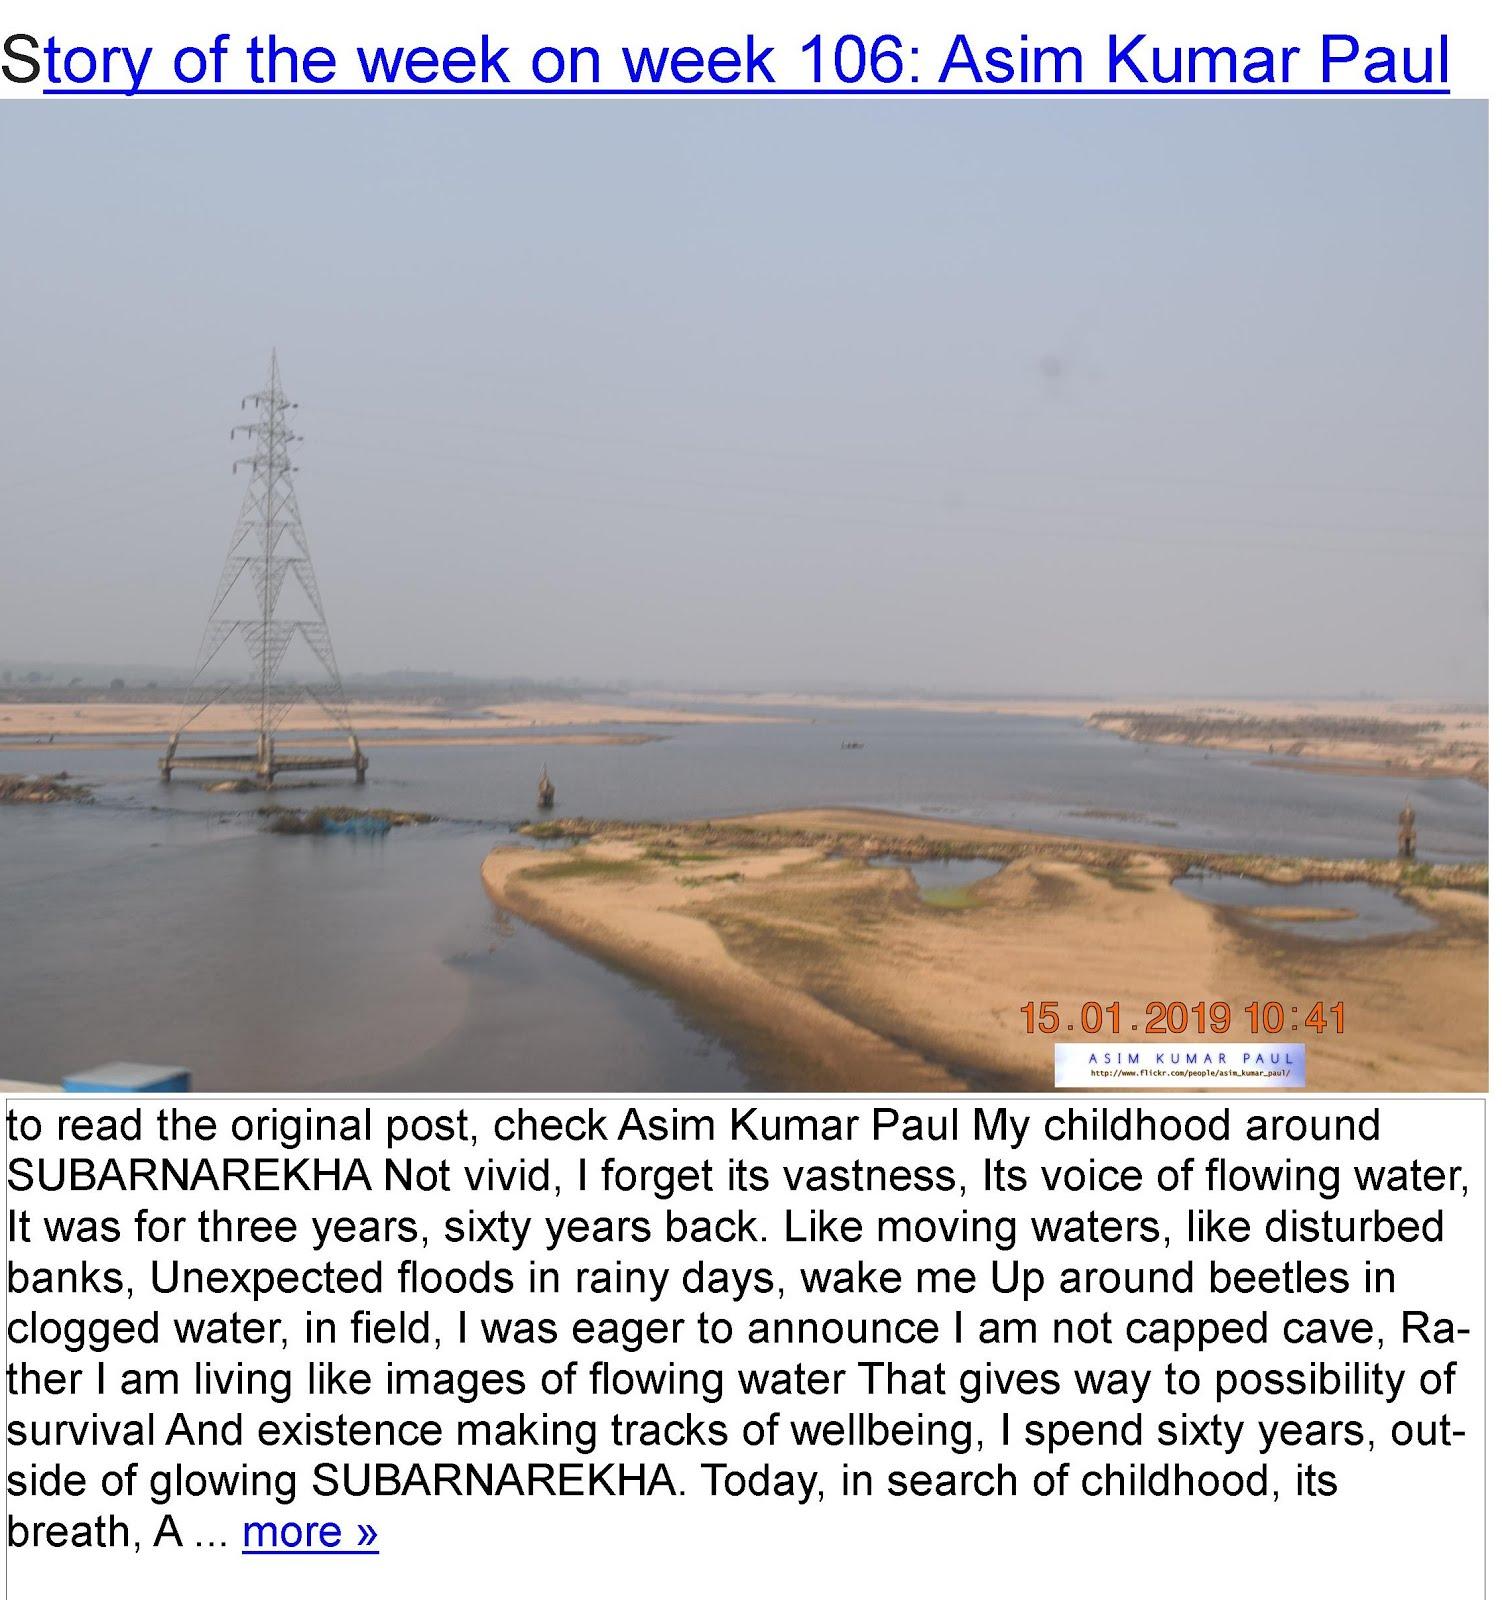 Bluebell Books Twitter Club: Story of the week on week 106: Asim Kumar Paul